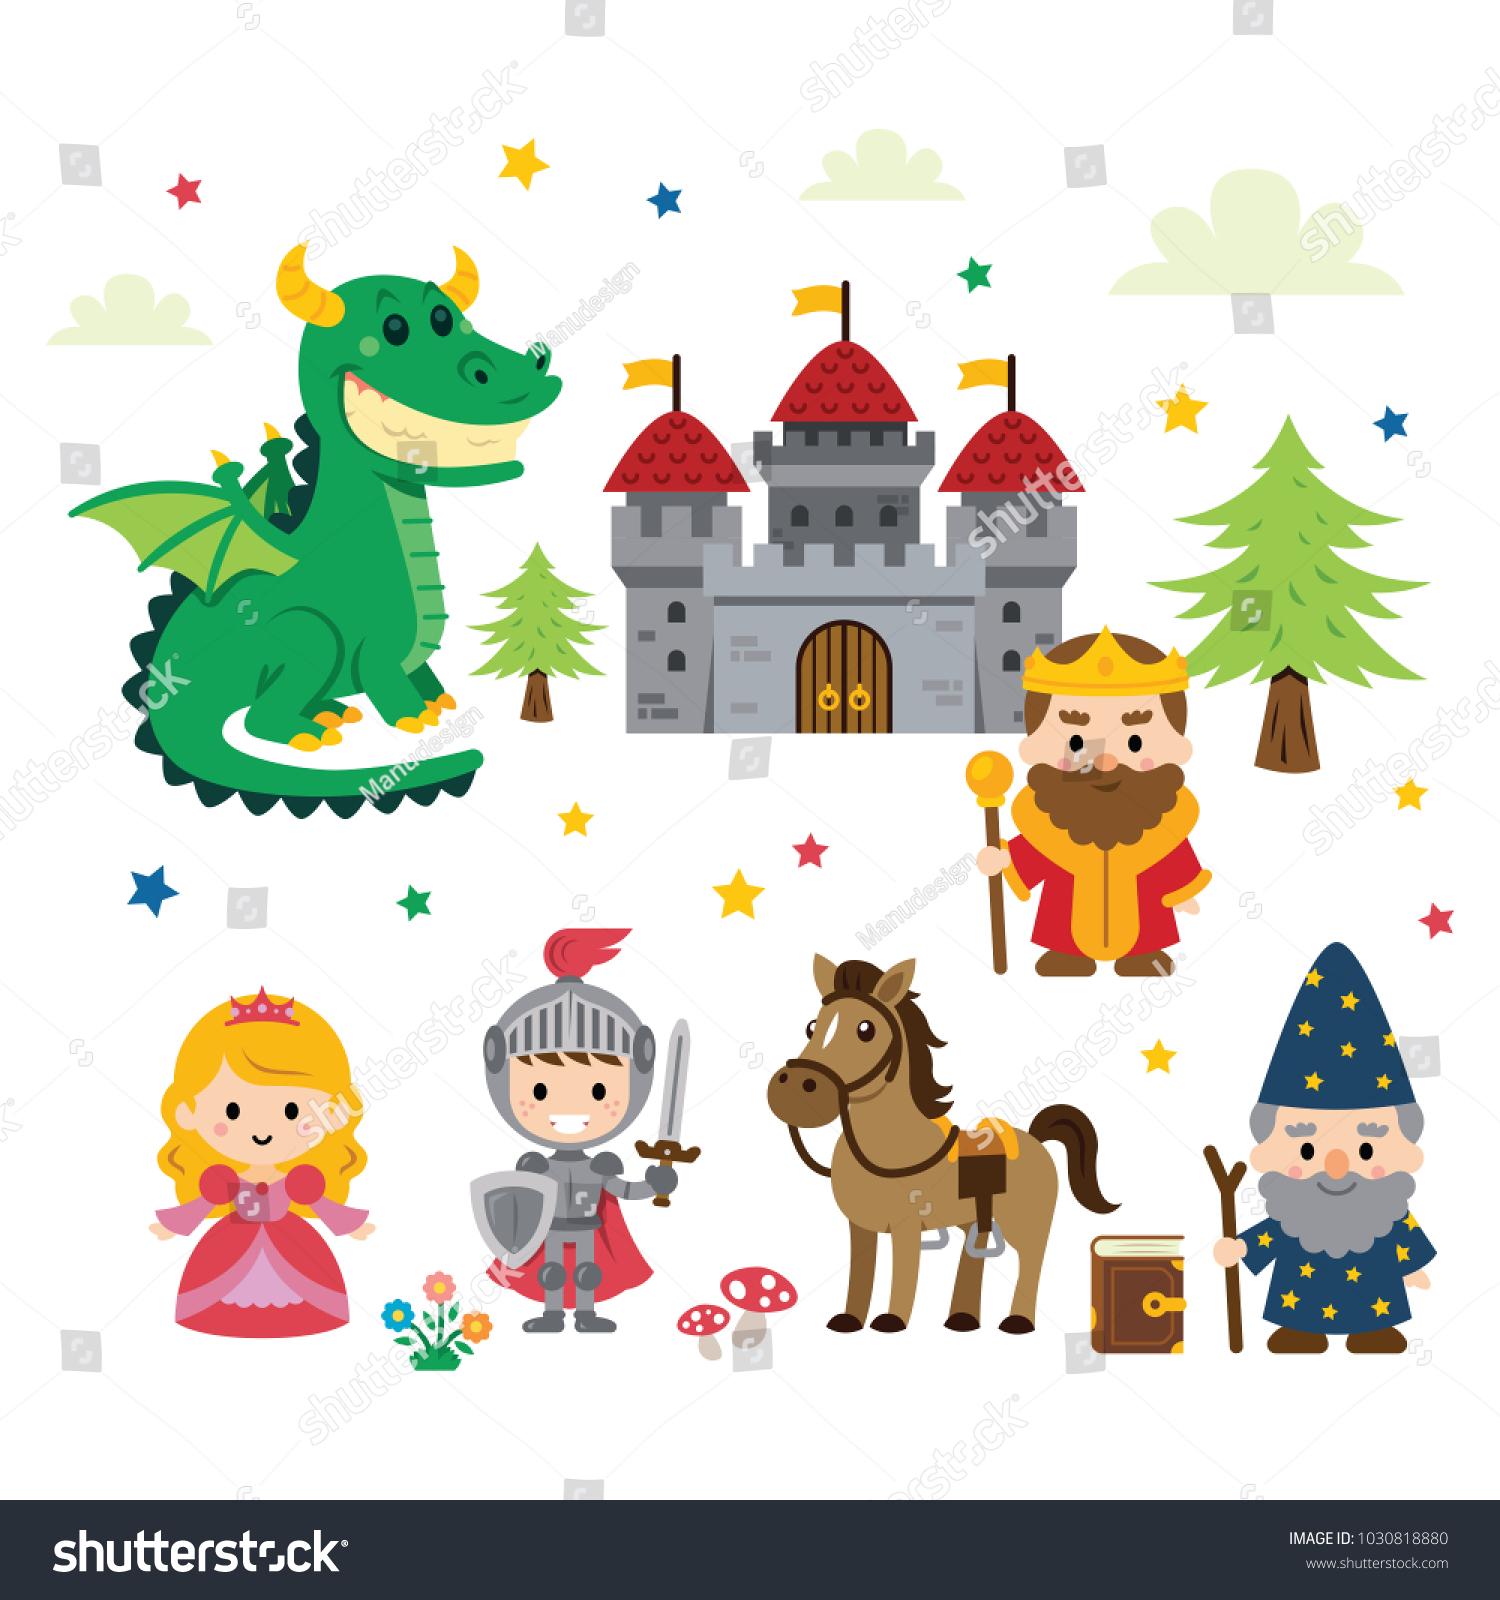 Fantasy Fairy Tale Clipart Different Characters Stock-Vektorgrafik ...